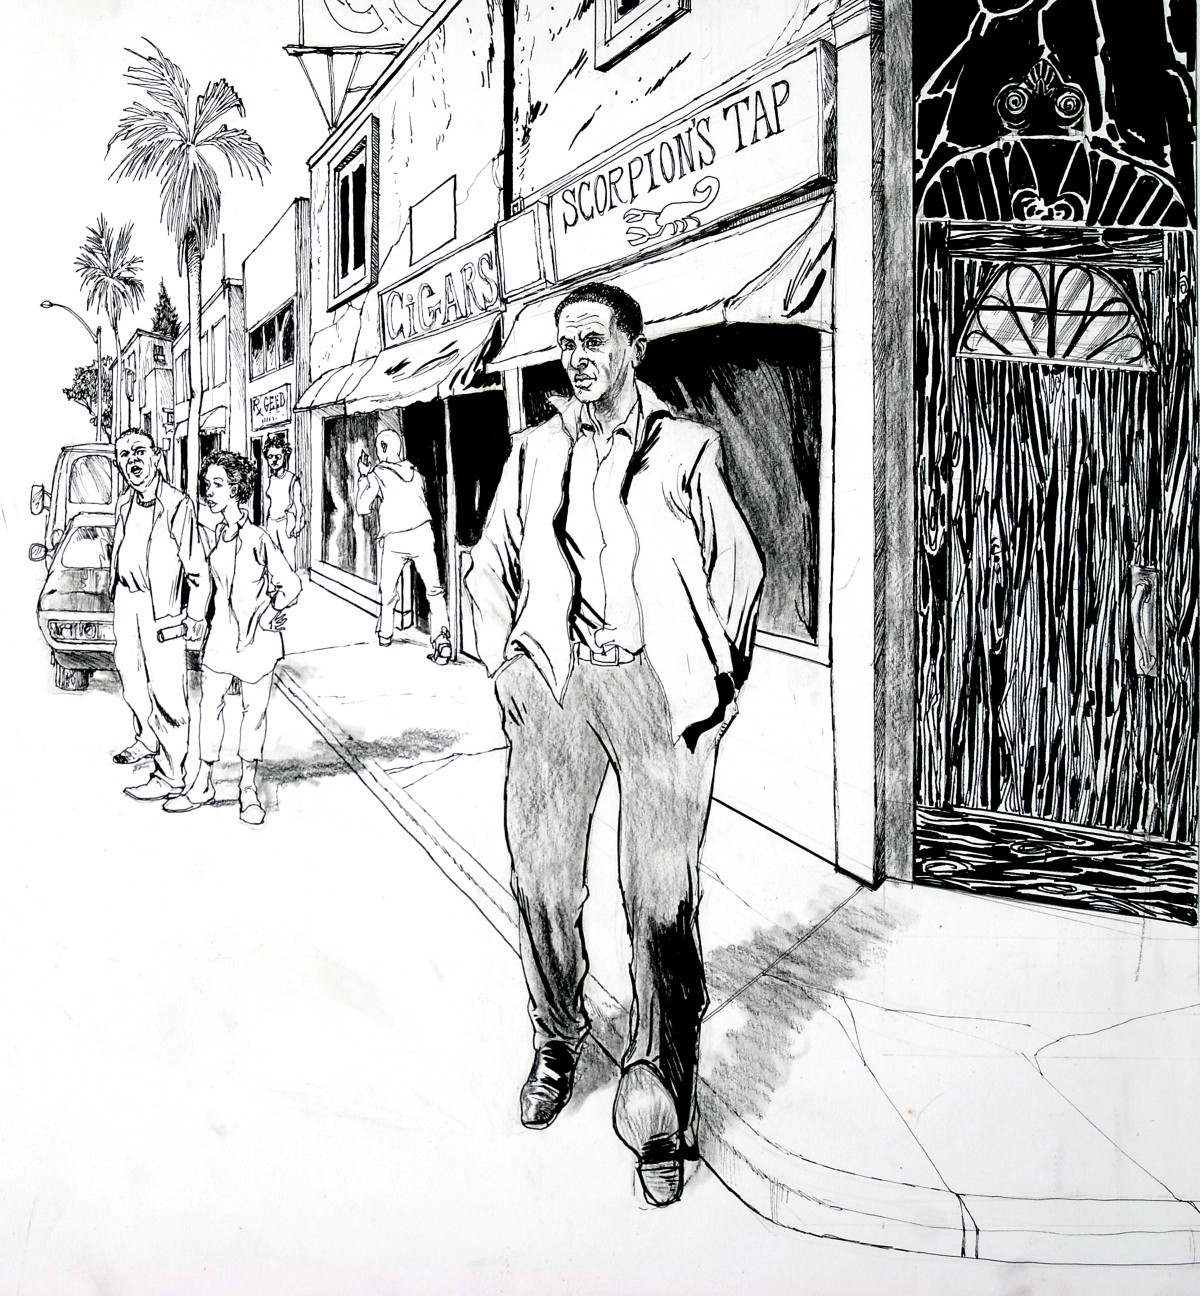 Hank street scene